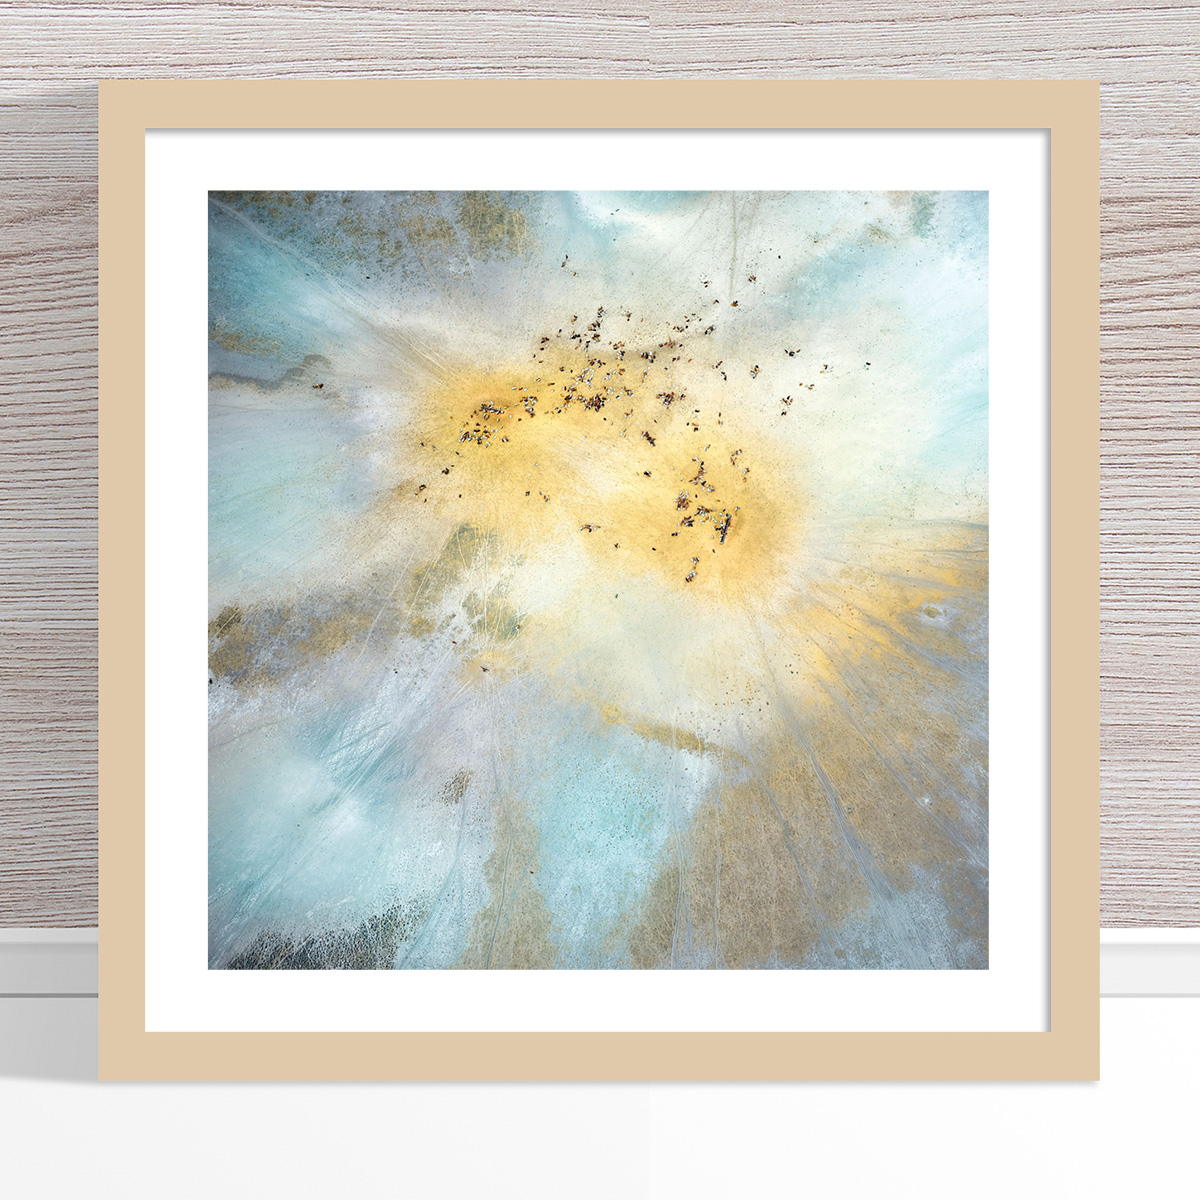 Chris Saunders - 'Aerial Outback 014' Light Frame